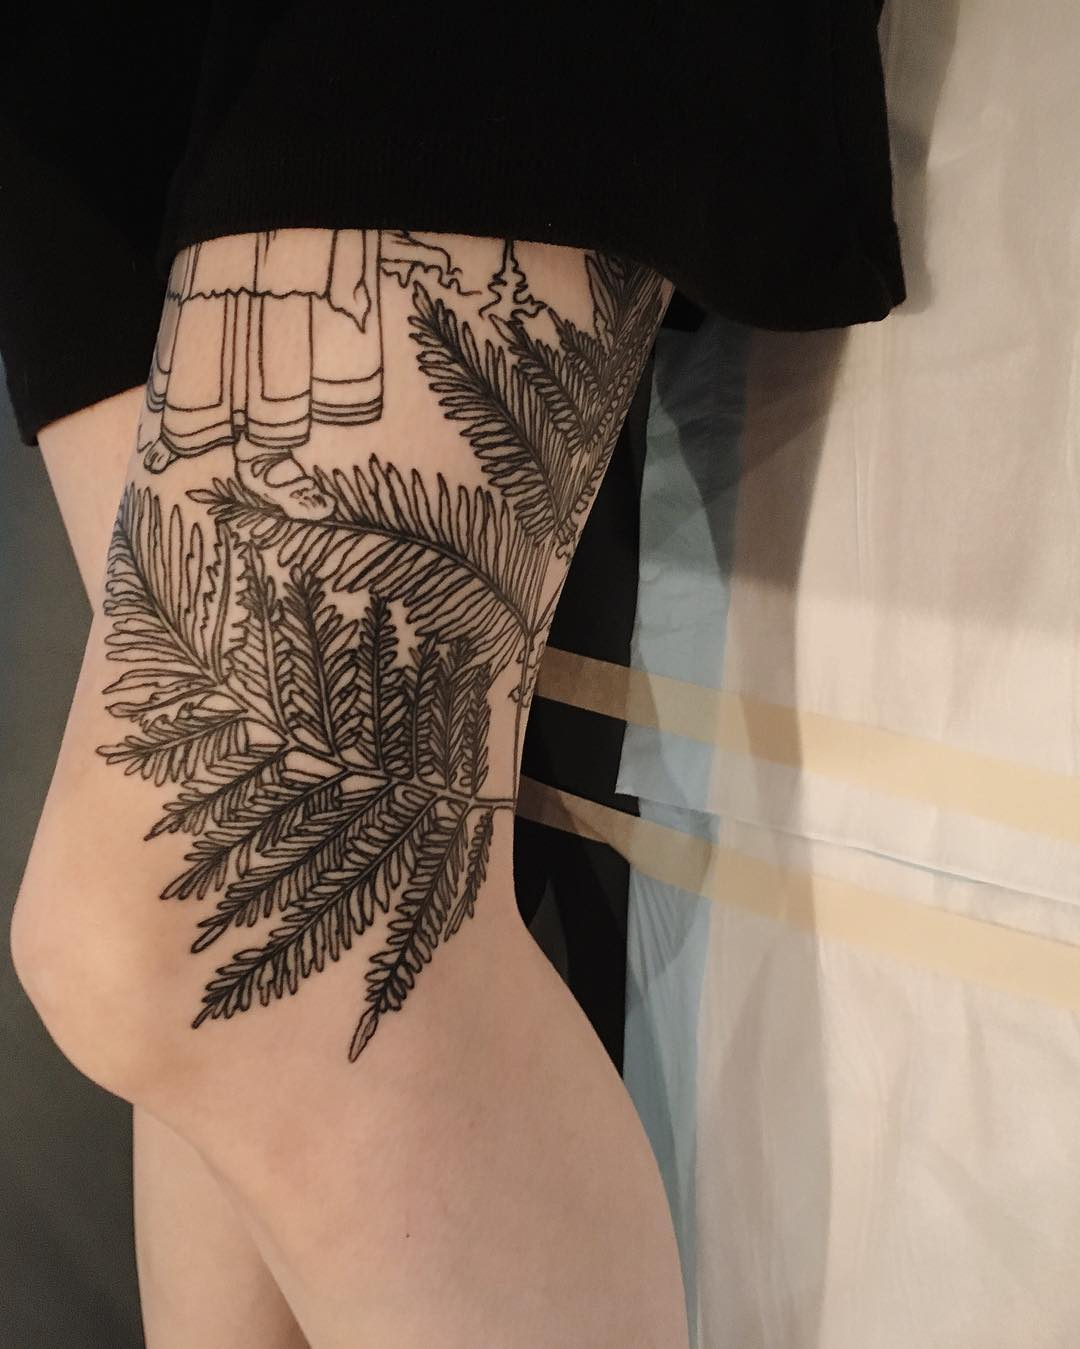 Russian fairytale leg sleeve by @sophiabaughan